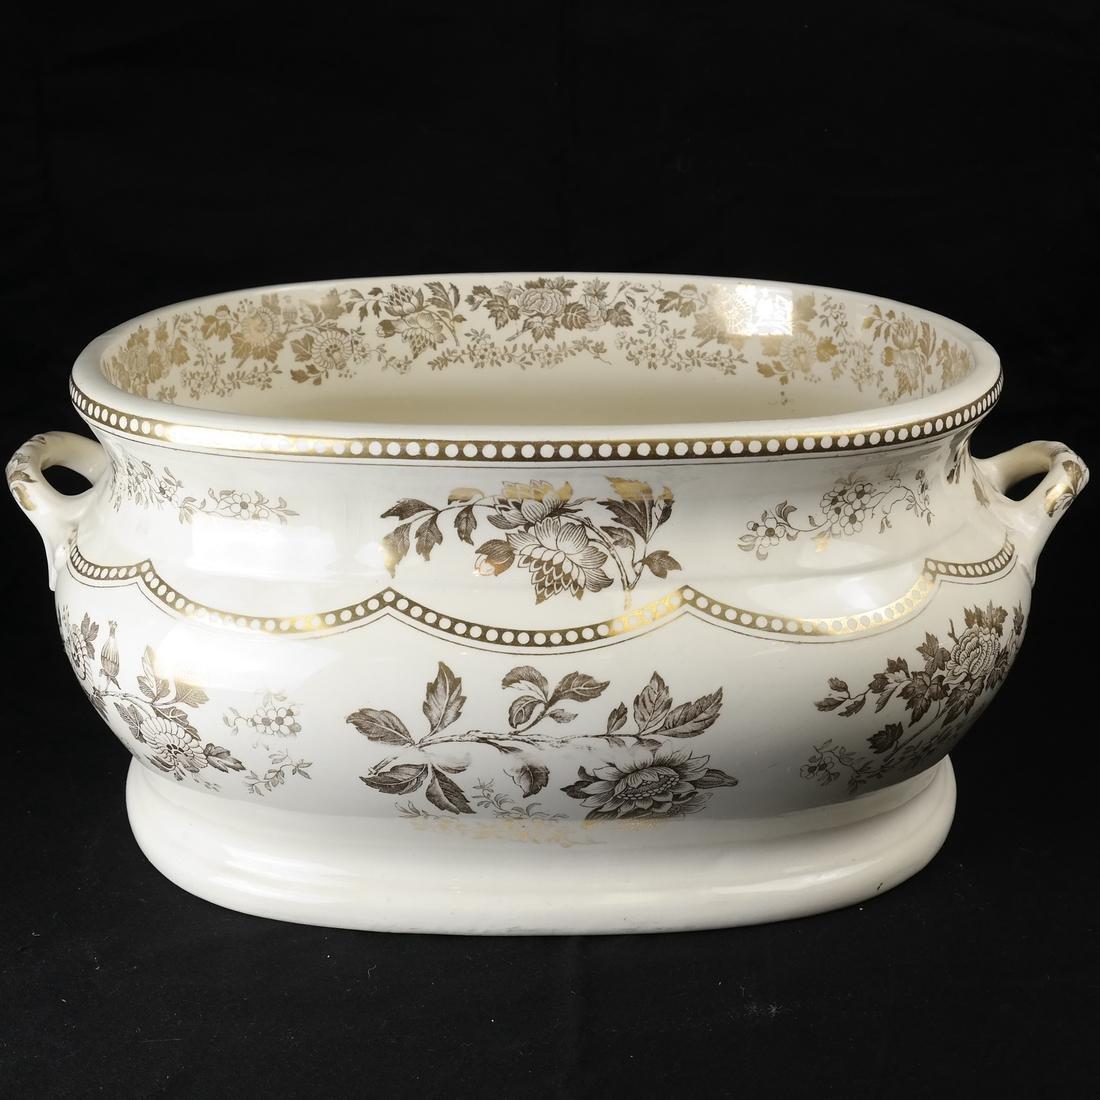 Parcel Gilt Ceramic Jardiniere